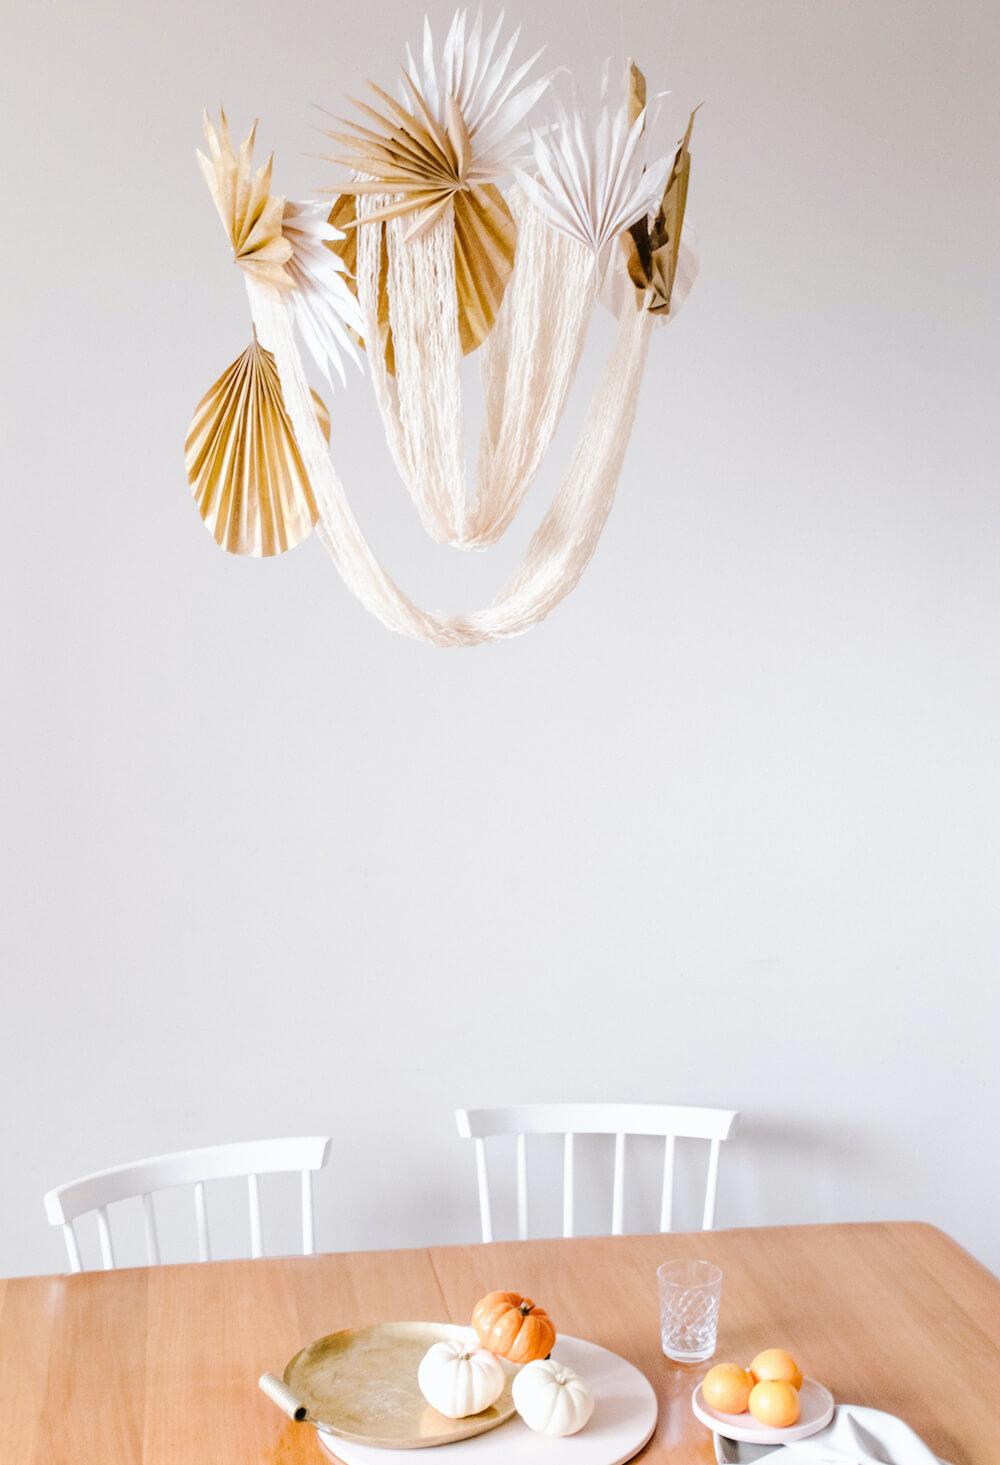 DIY Boho Yarn and Palm Frond Chandelier.